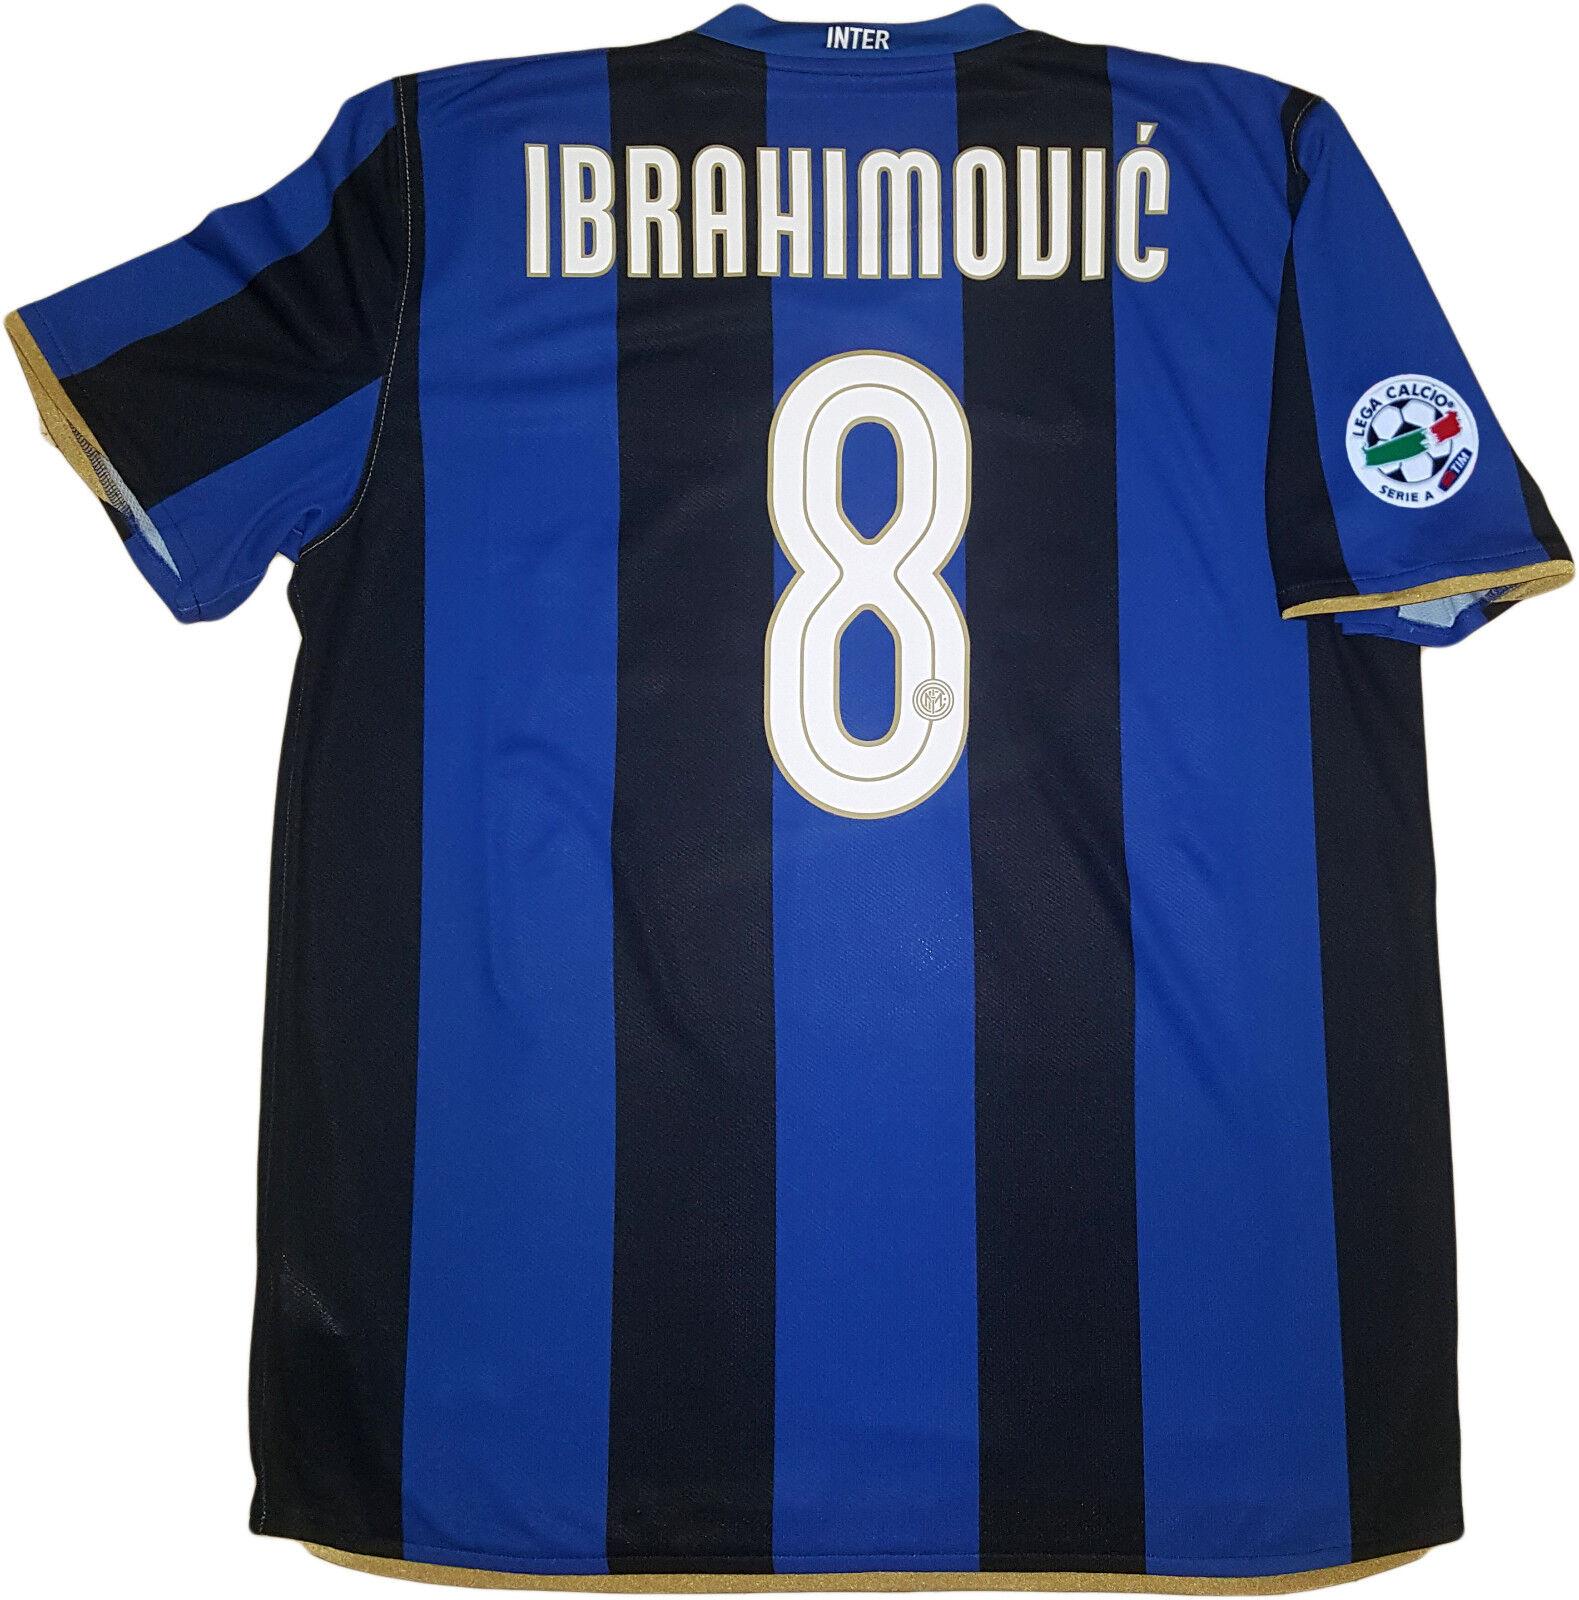 Ibrahimovic shirt maglia Inter 2008 2009 Home Jersey Nike Nike Nike XL Pirelli Scudetto 9e7bd6